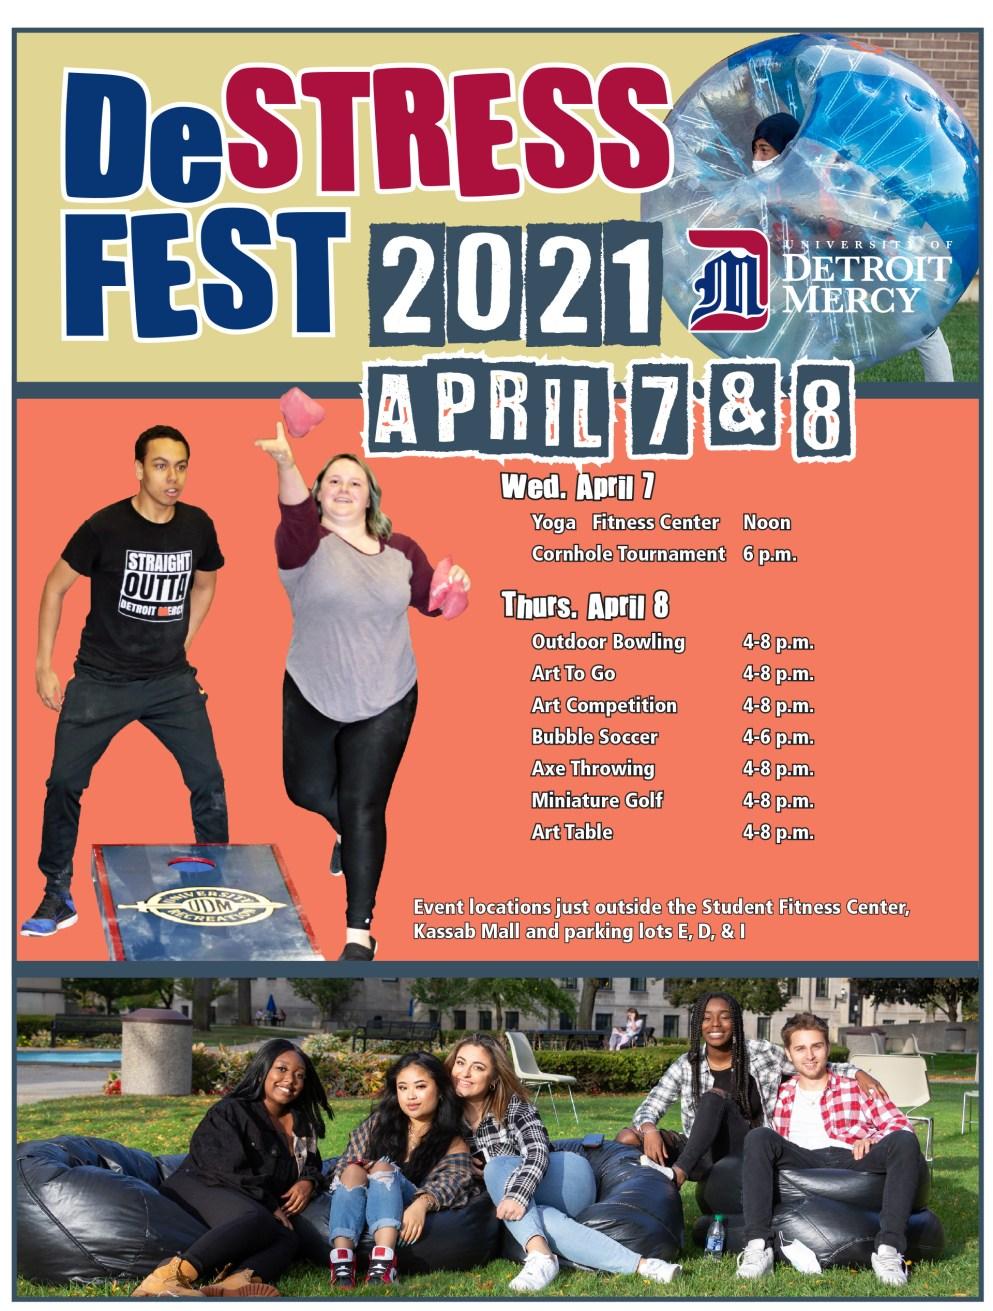 De-Stress Fest 2021 Flier with students playing cornhole.